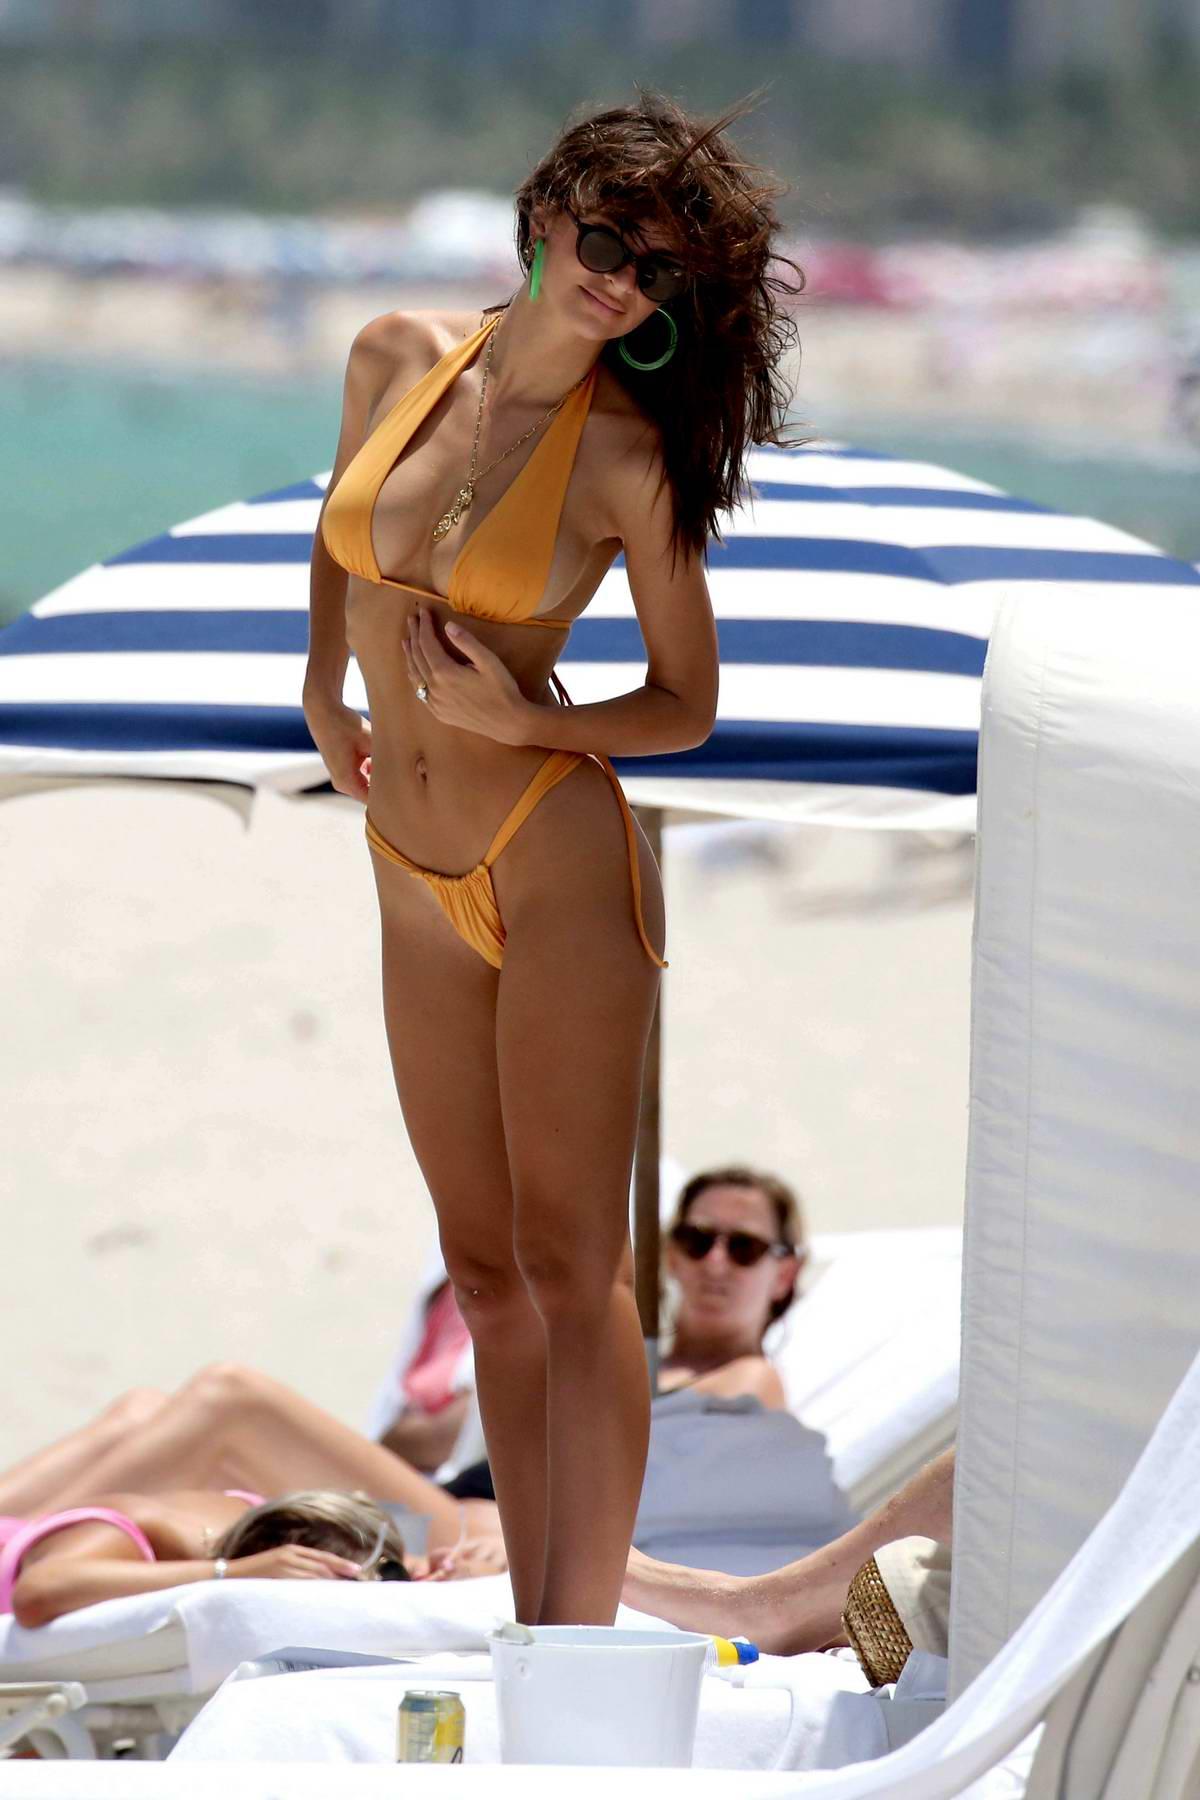 emily ratajkowski sizzles in an orange bikini during a relaxing beach day with husband sebastian bear-mcclard in miami, florida-210718_#